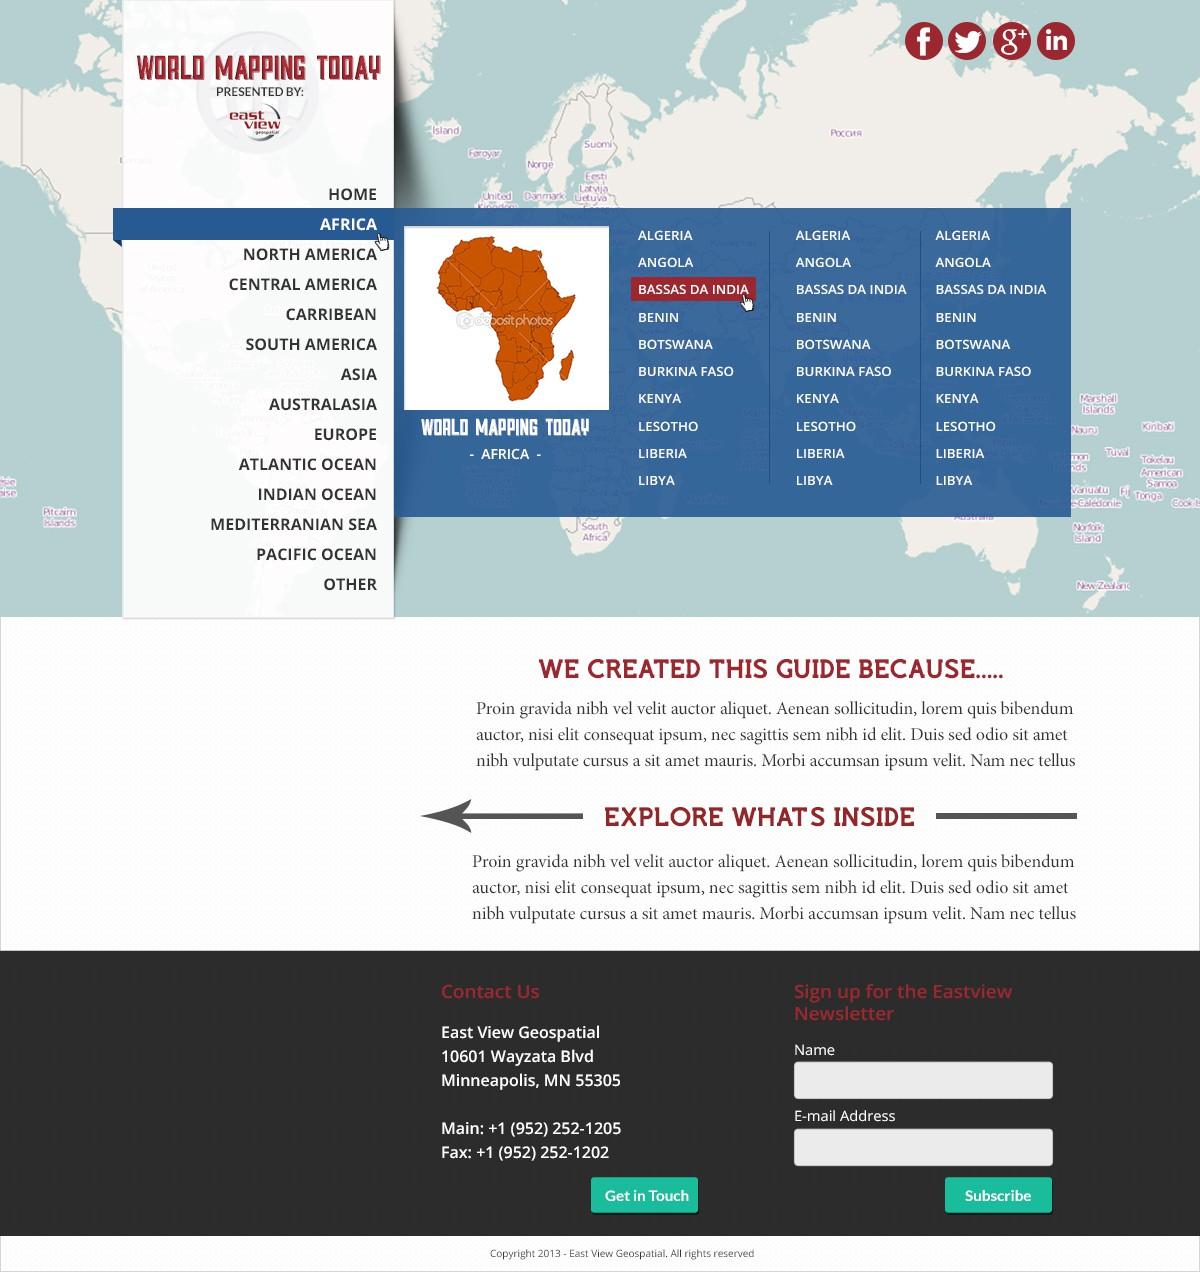 Map maker - Geospatial needs a new website design